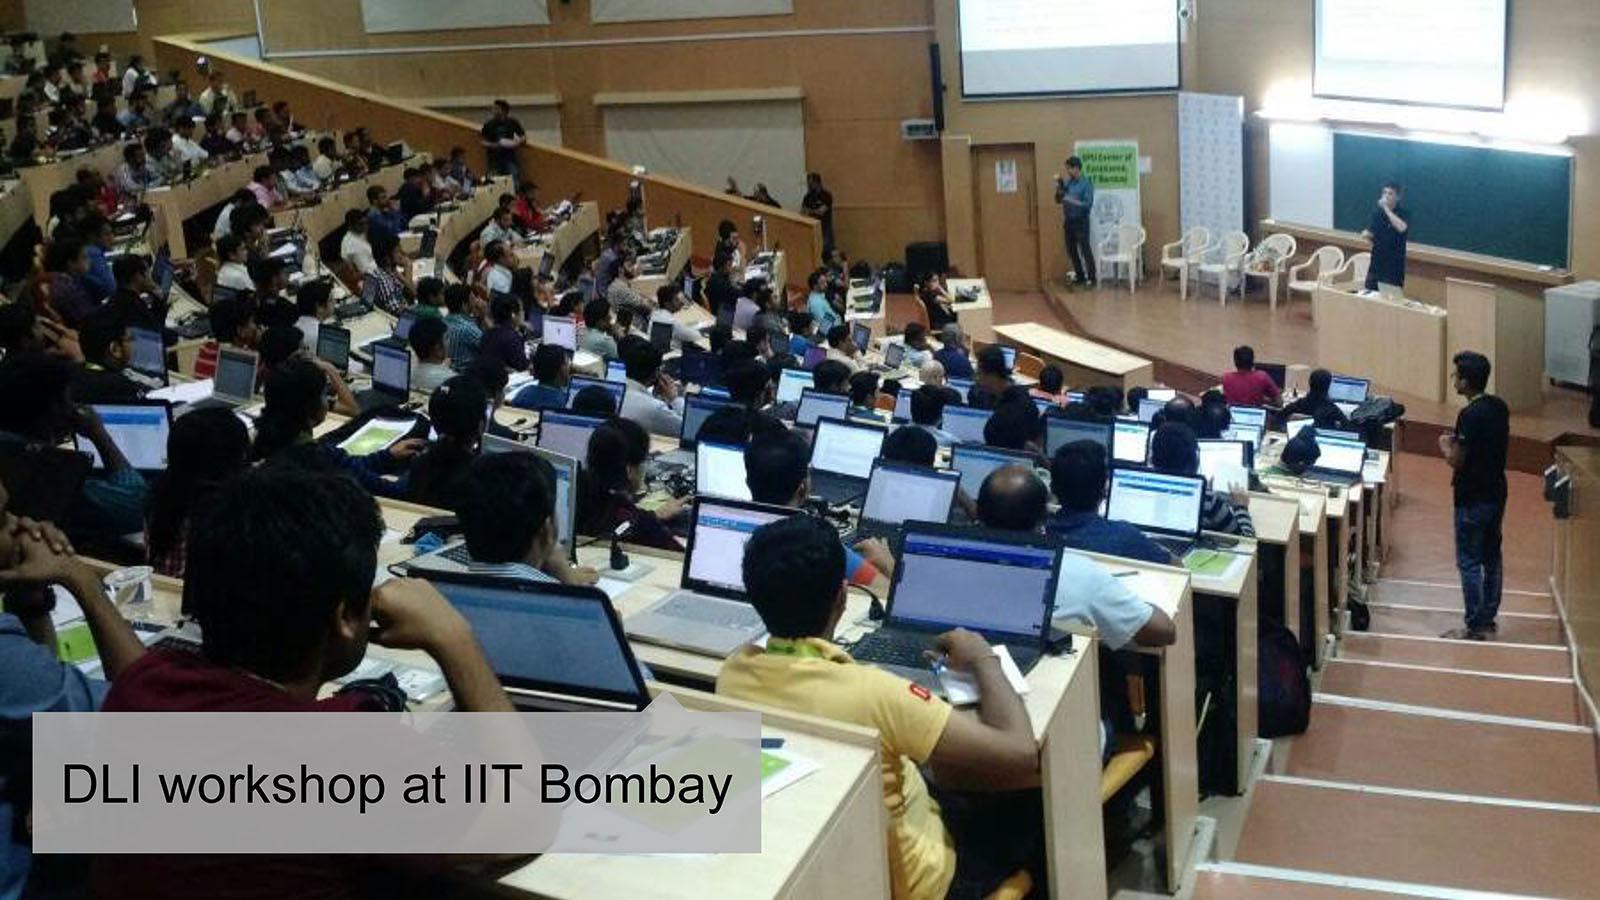 NVIDIA-DLI-Lab-at-IIT-Bombay.jpg